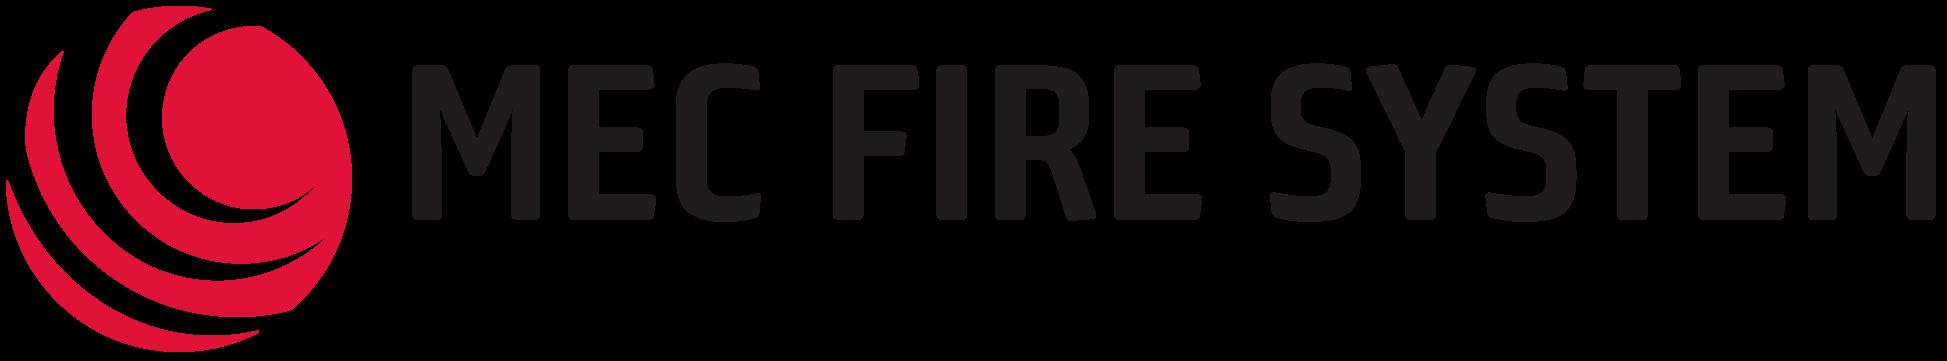 Mec Fire System